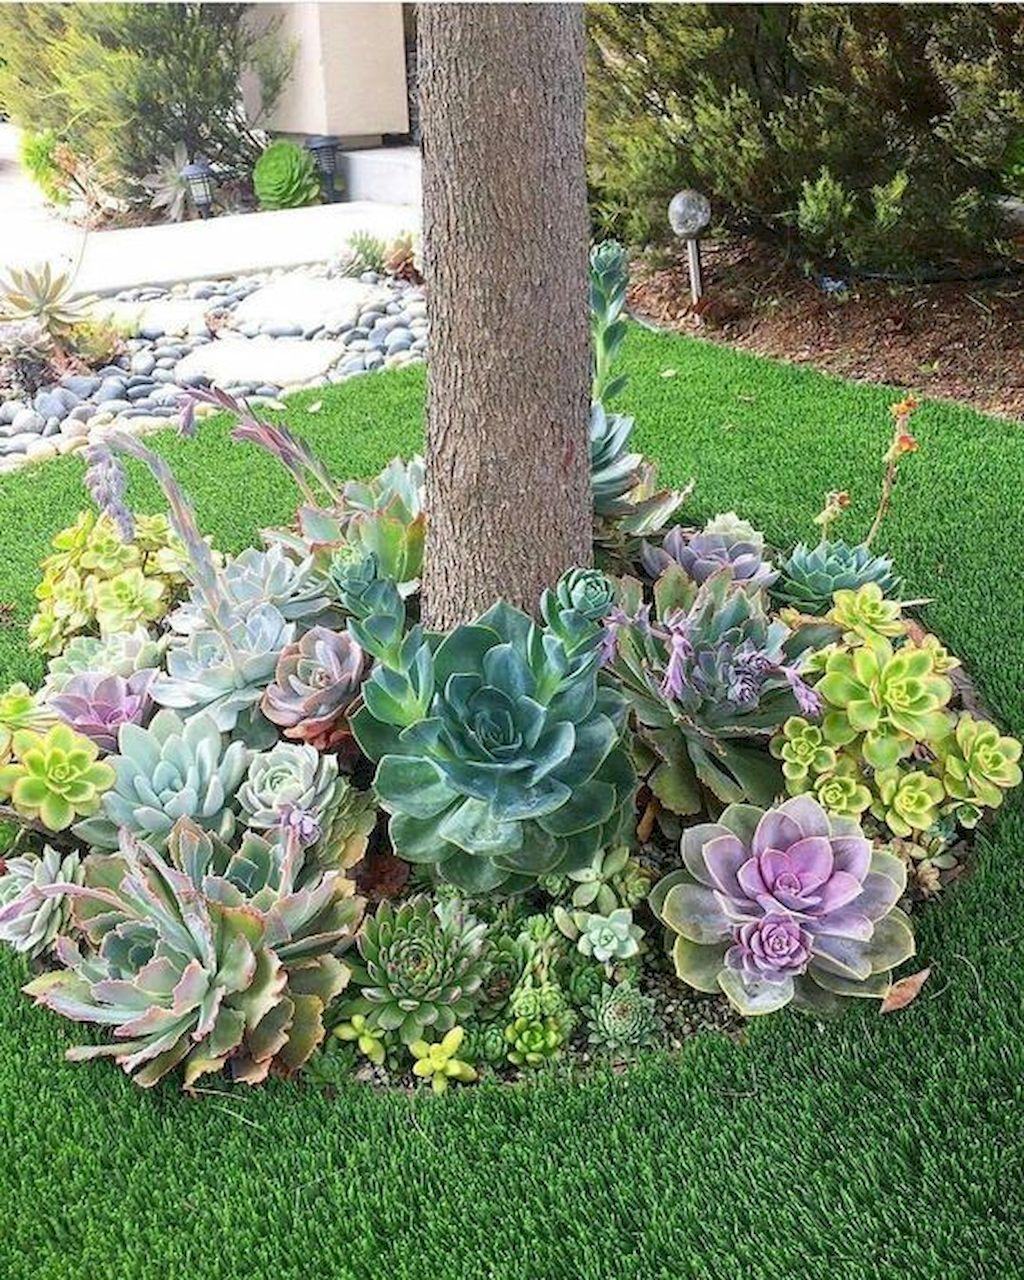 50 Green Backyard And Front Yard Landscaping Ideas Succulent Landscaping Succulent Landscape Design Yard Landscaping